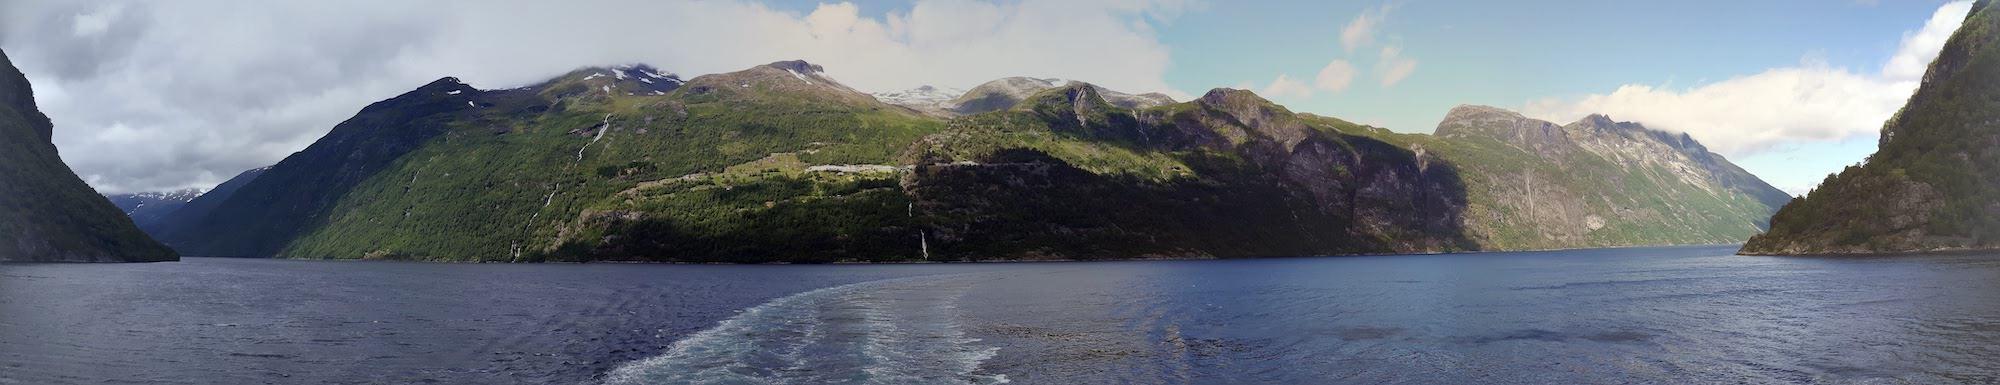 Pabo Geirangerfjord Norway